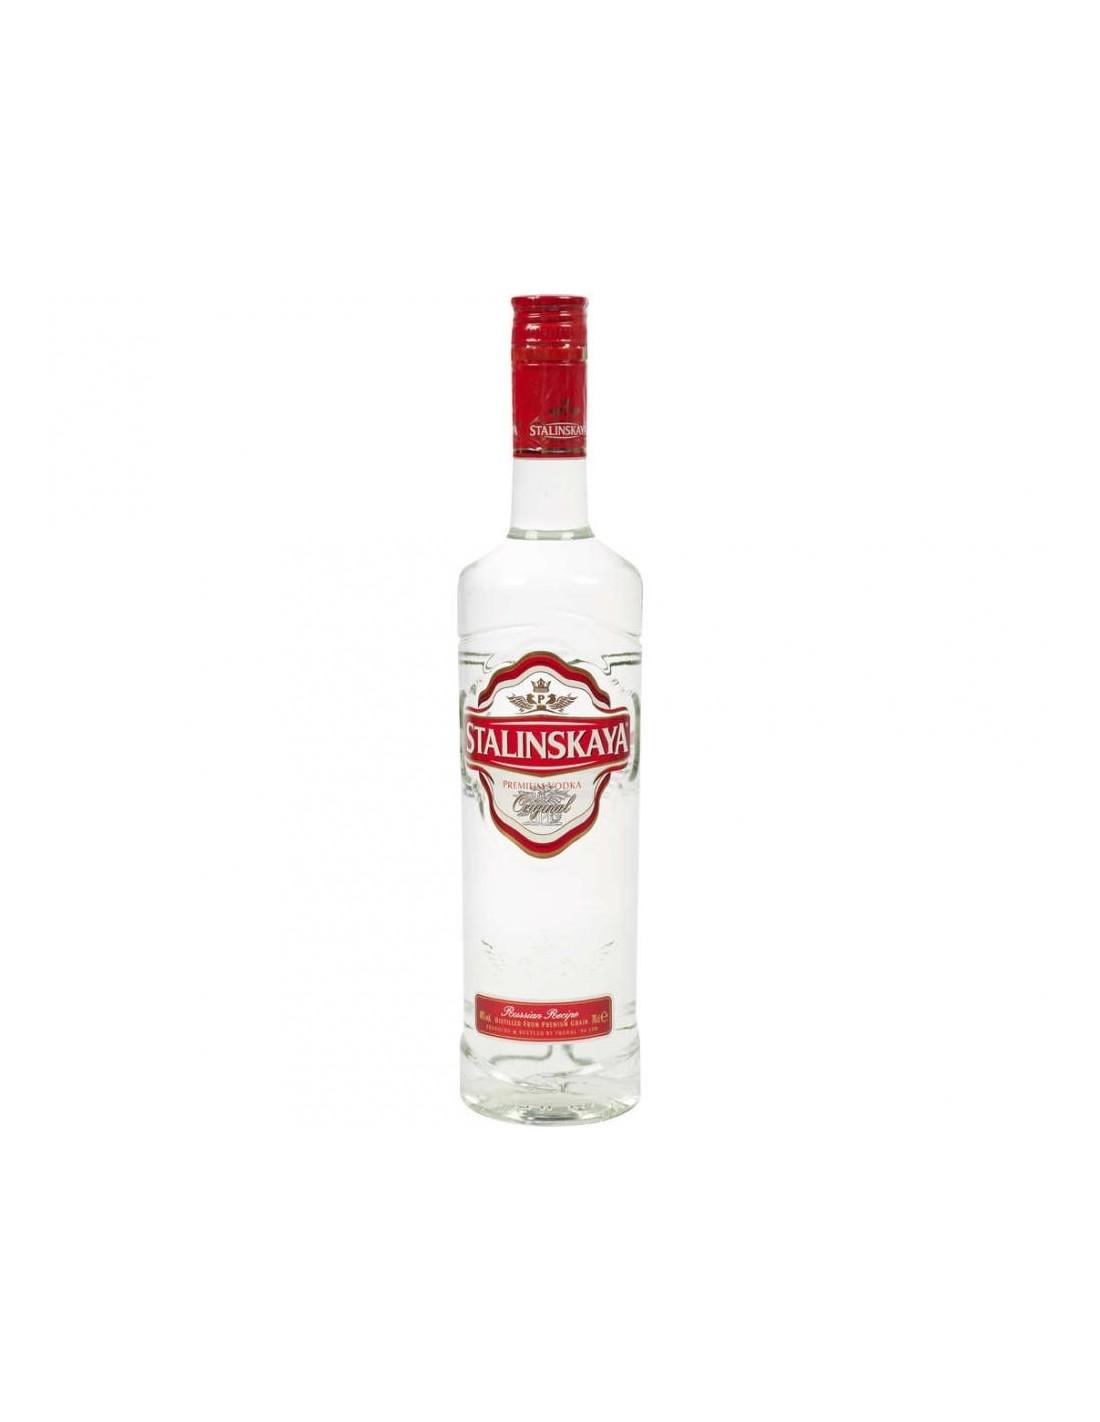 Vodca Stalinskaya 0.5L, 40% alc., Romania